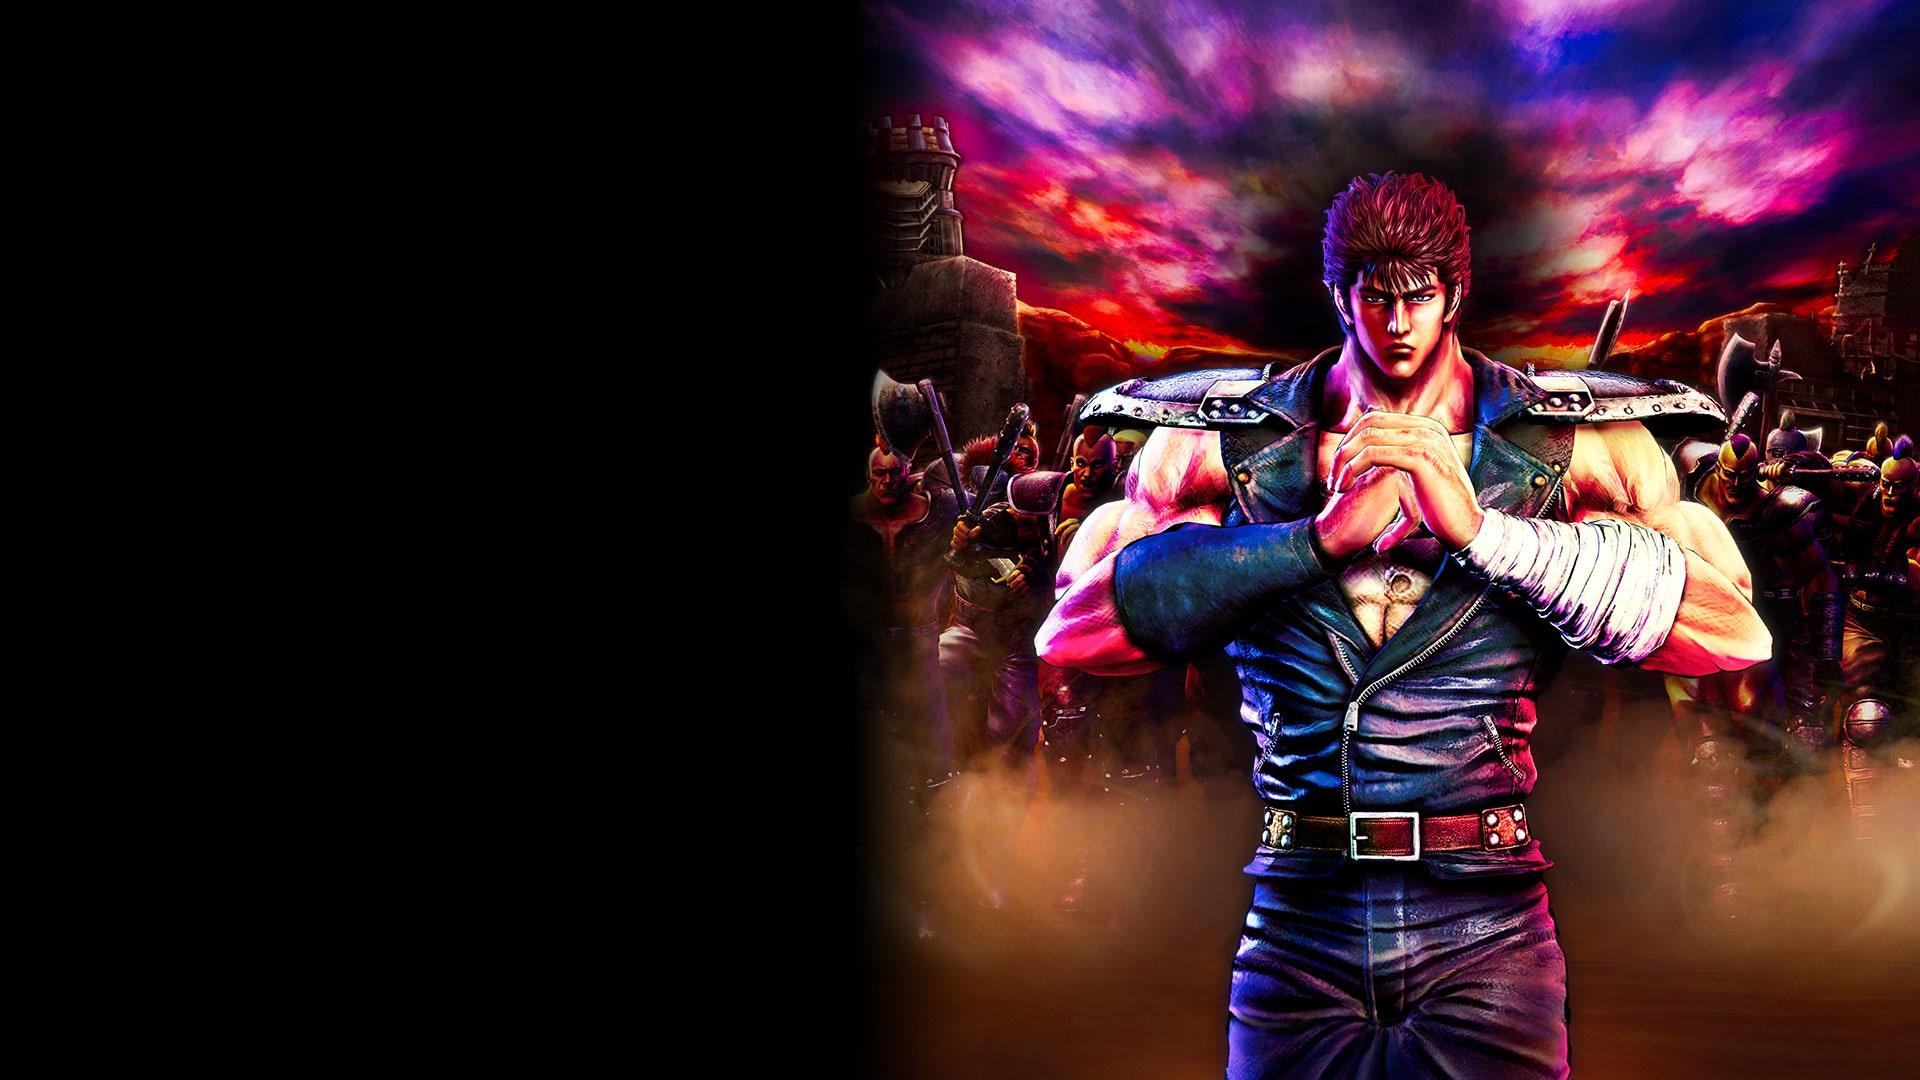 Fist of the North Star: Lost Paradise - Kazuma Kiryu Skin